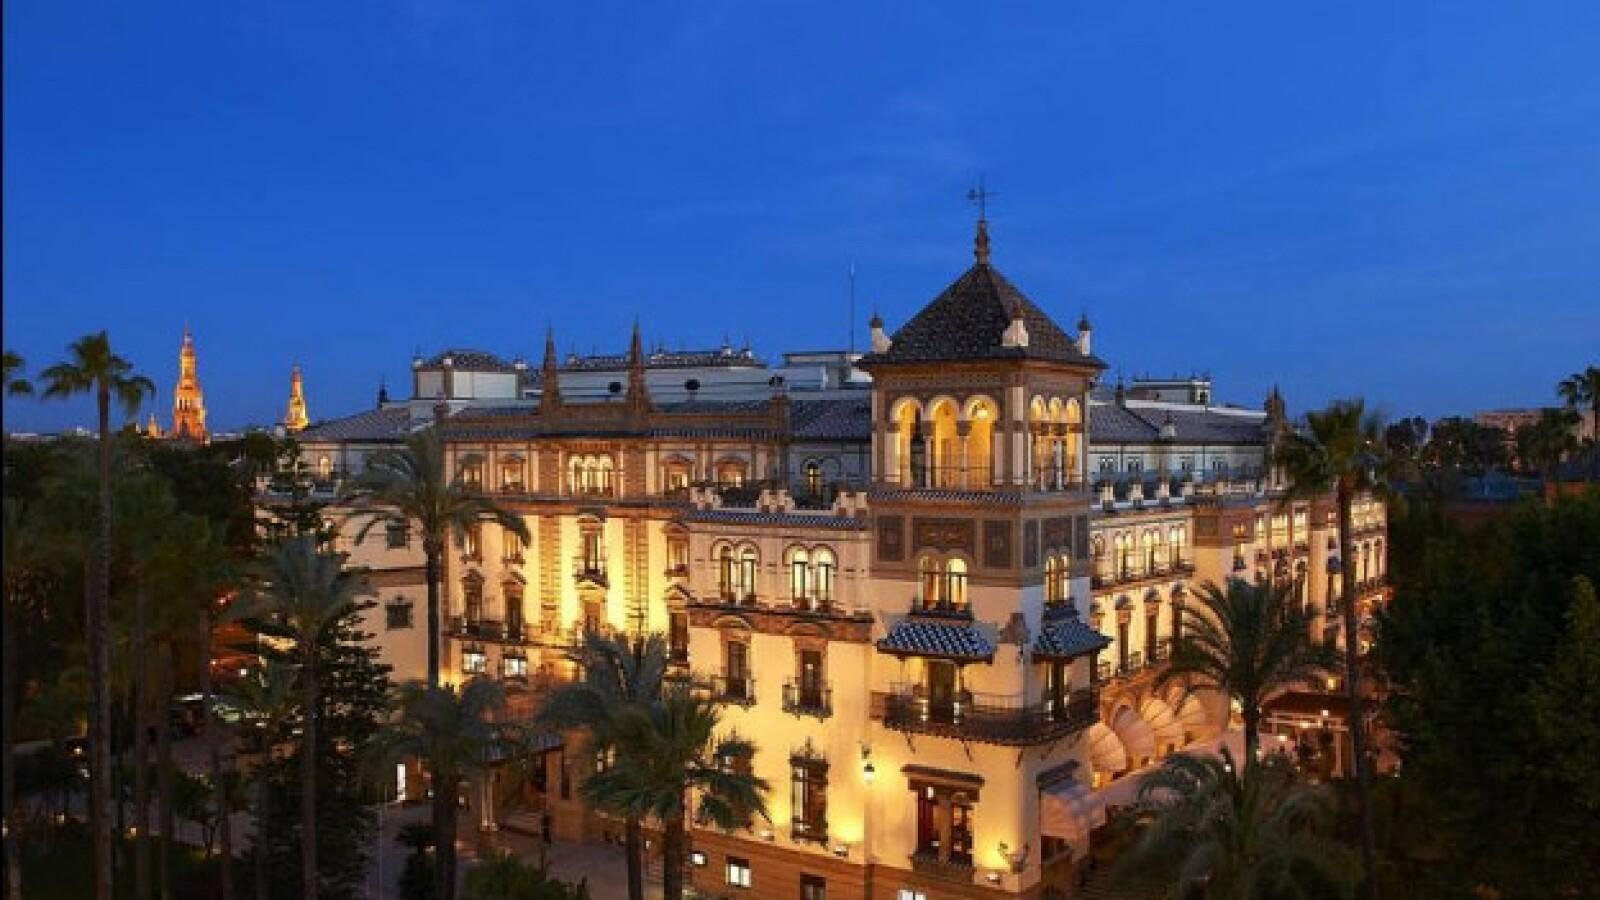 Hotel Alfonso XIII locacion Lawrence of Arabia